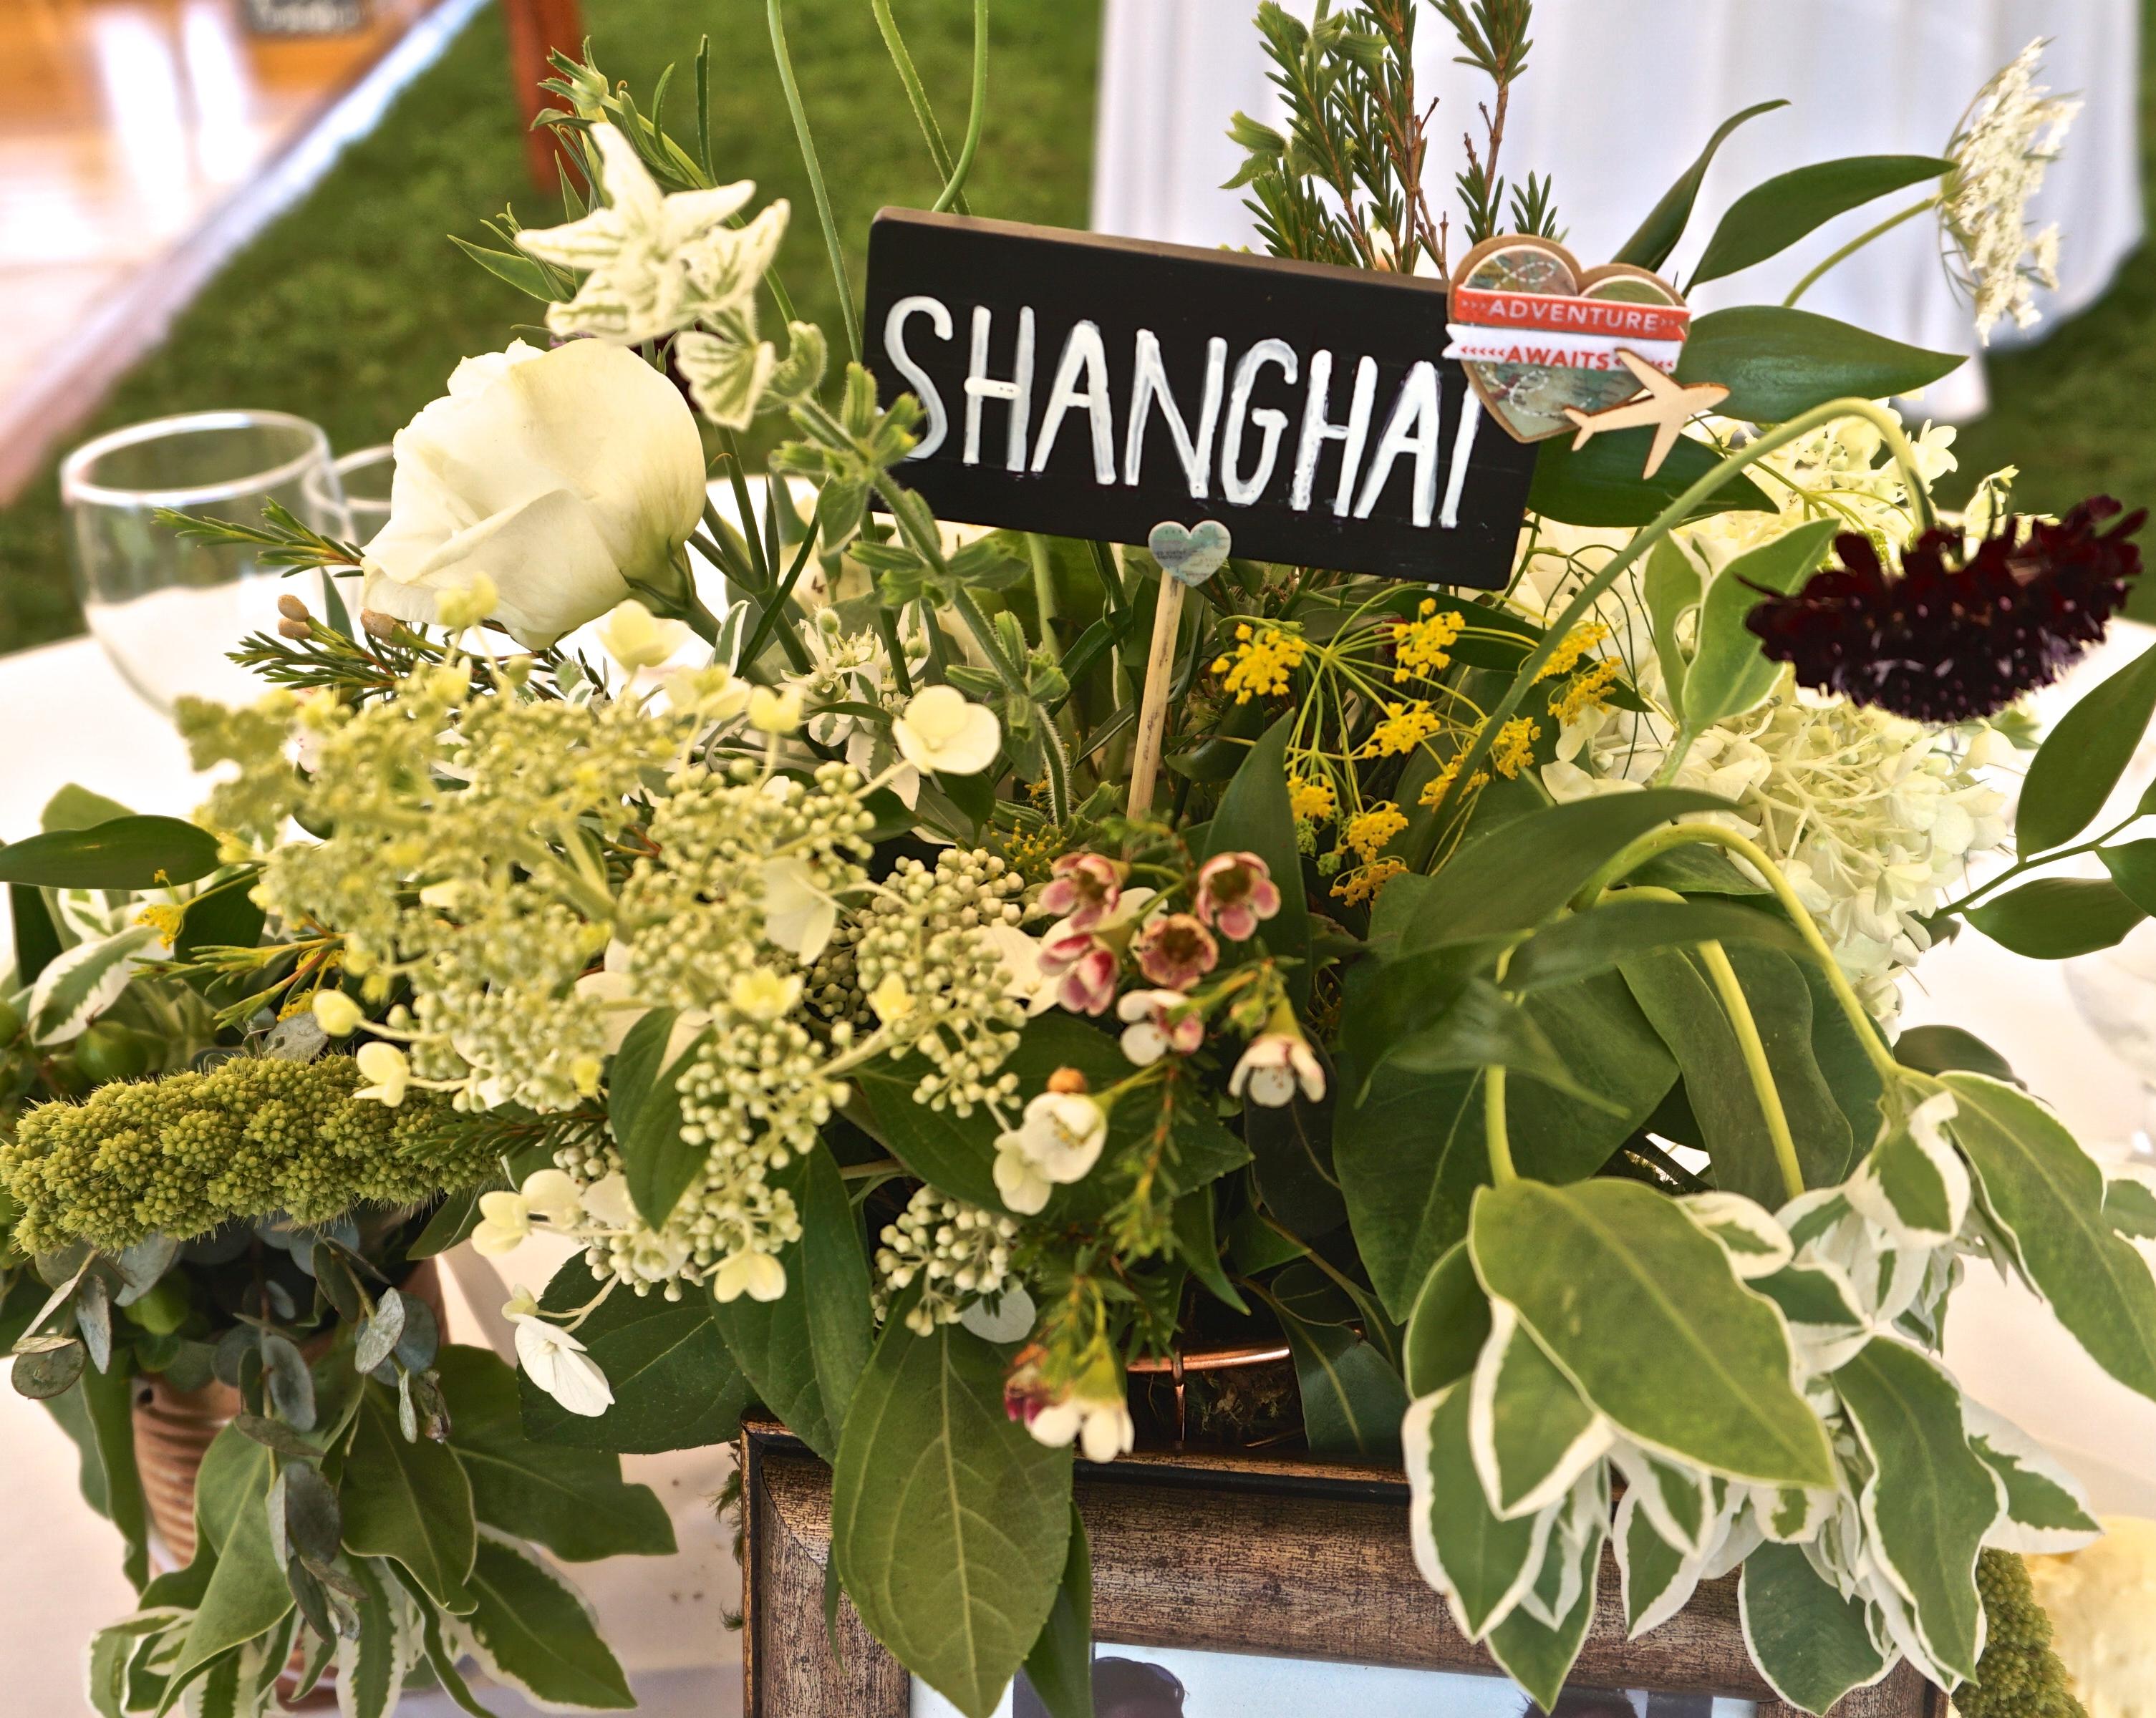 That's Shanghai